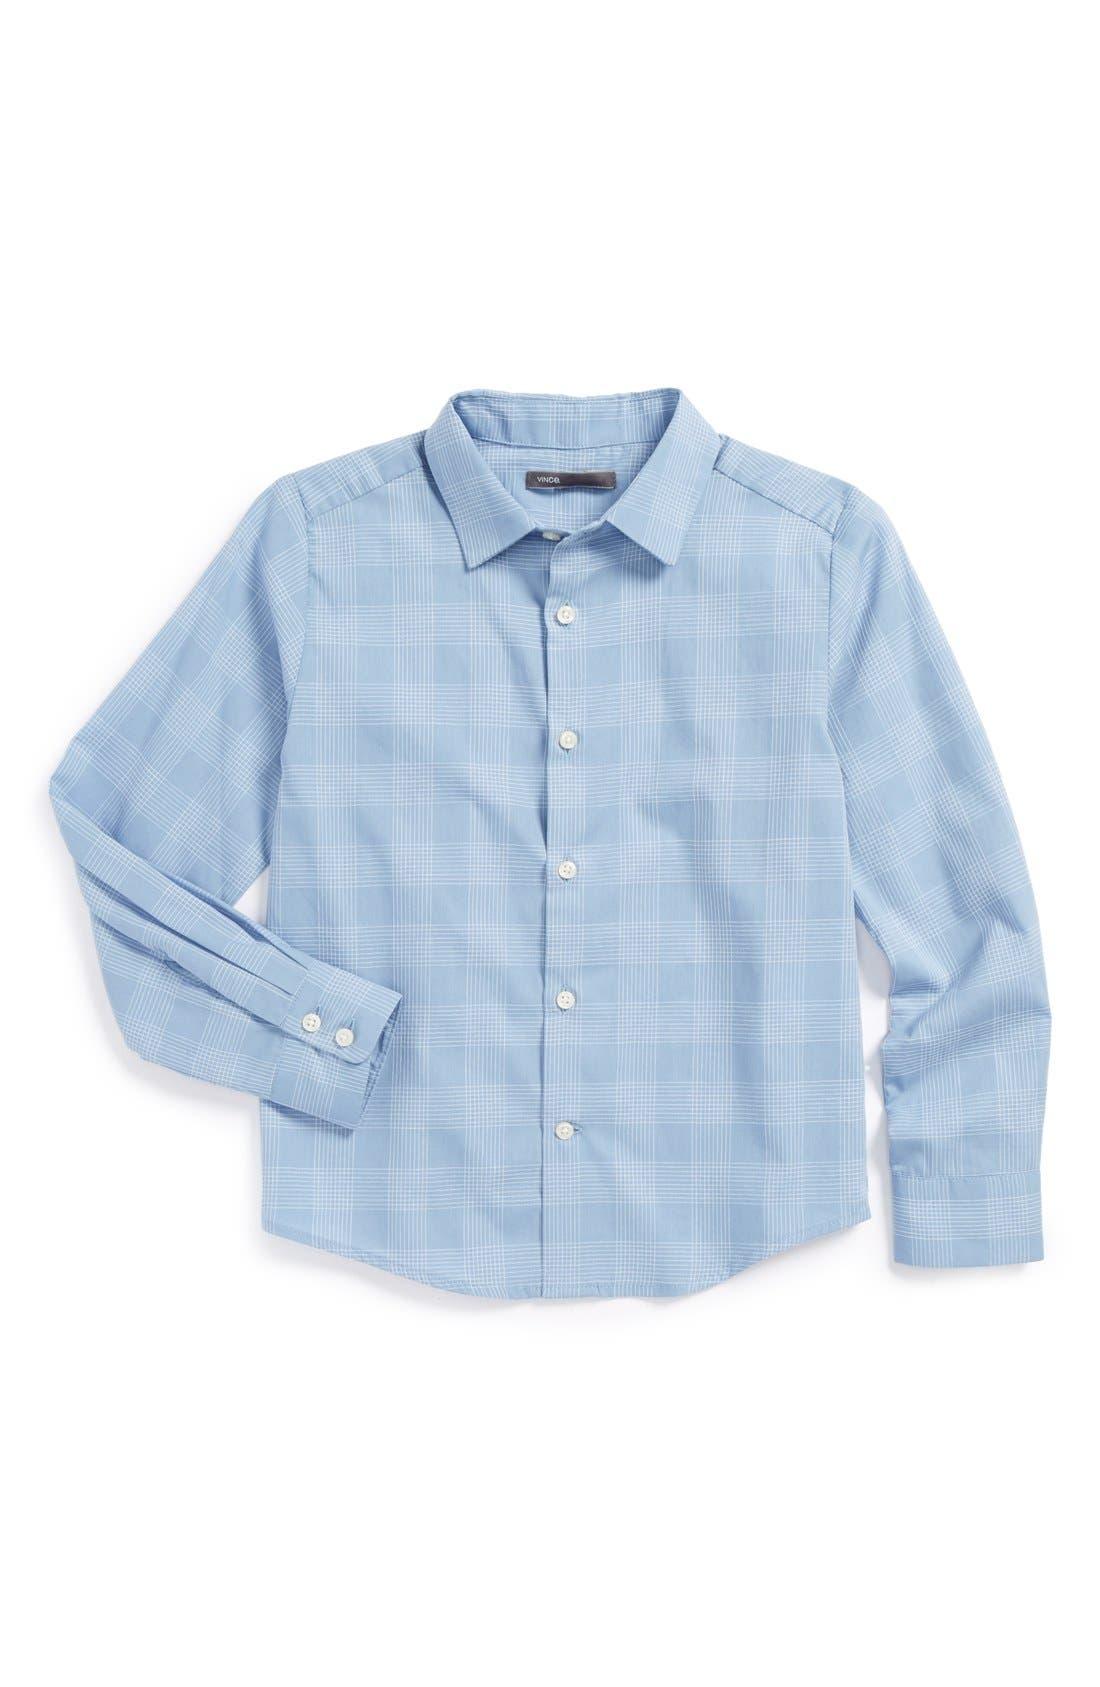 Main Image - Vince 'Dobby' Cotton Sport Shirt (Big Boys)